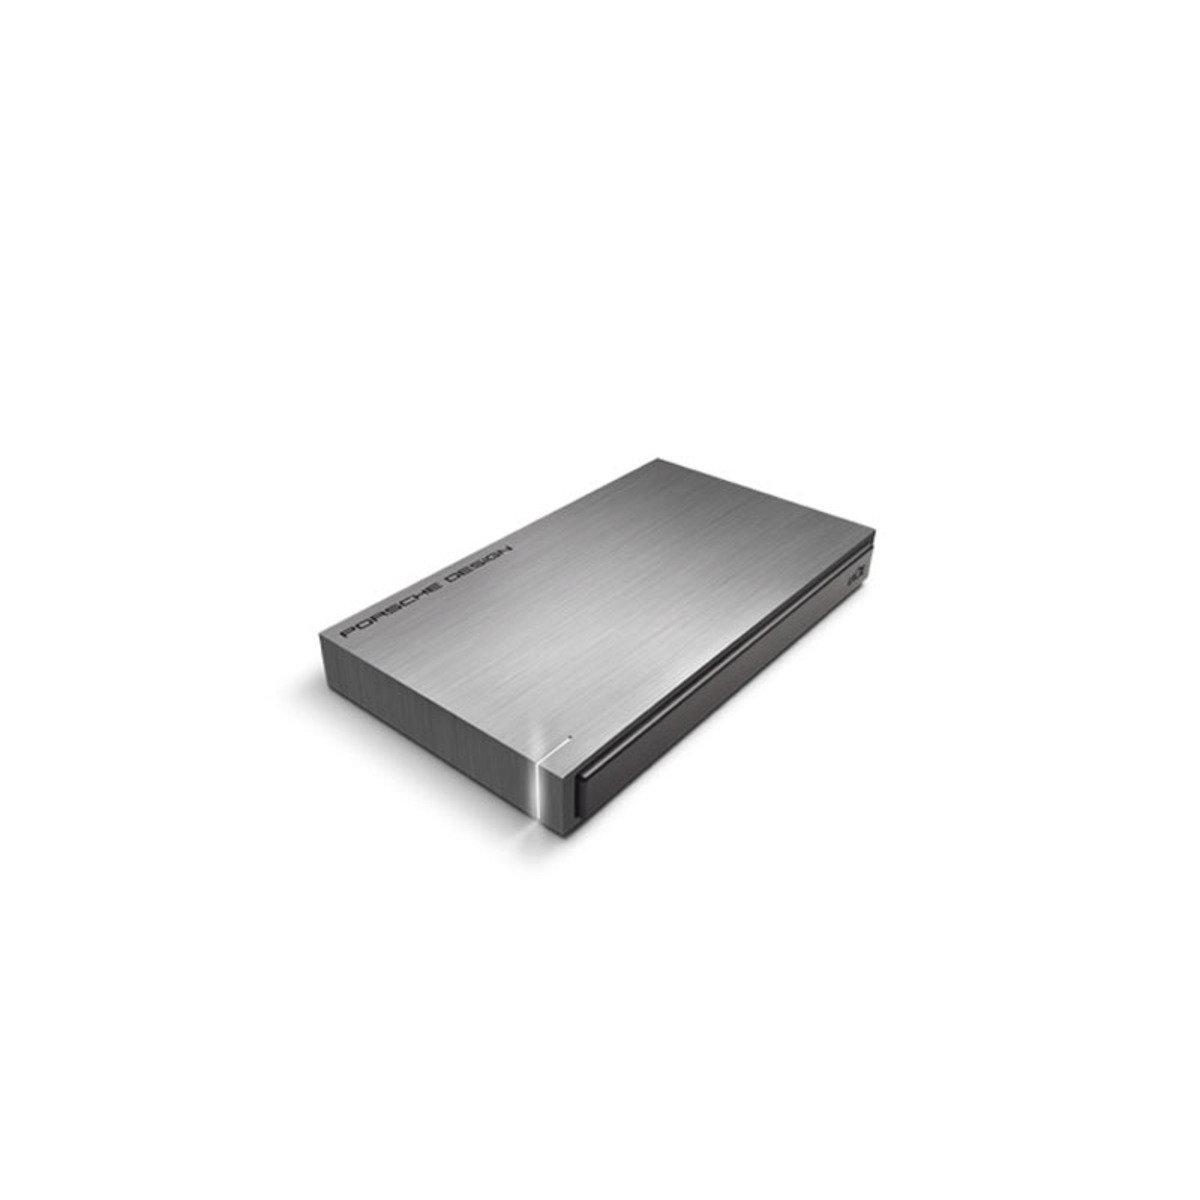 Porsche Design Mobile 2TB USB3.0 2.5吋 外置硬碟 9000459